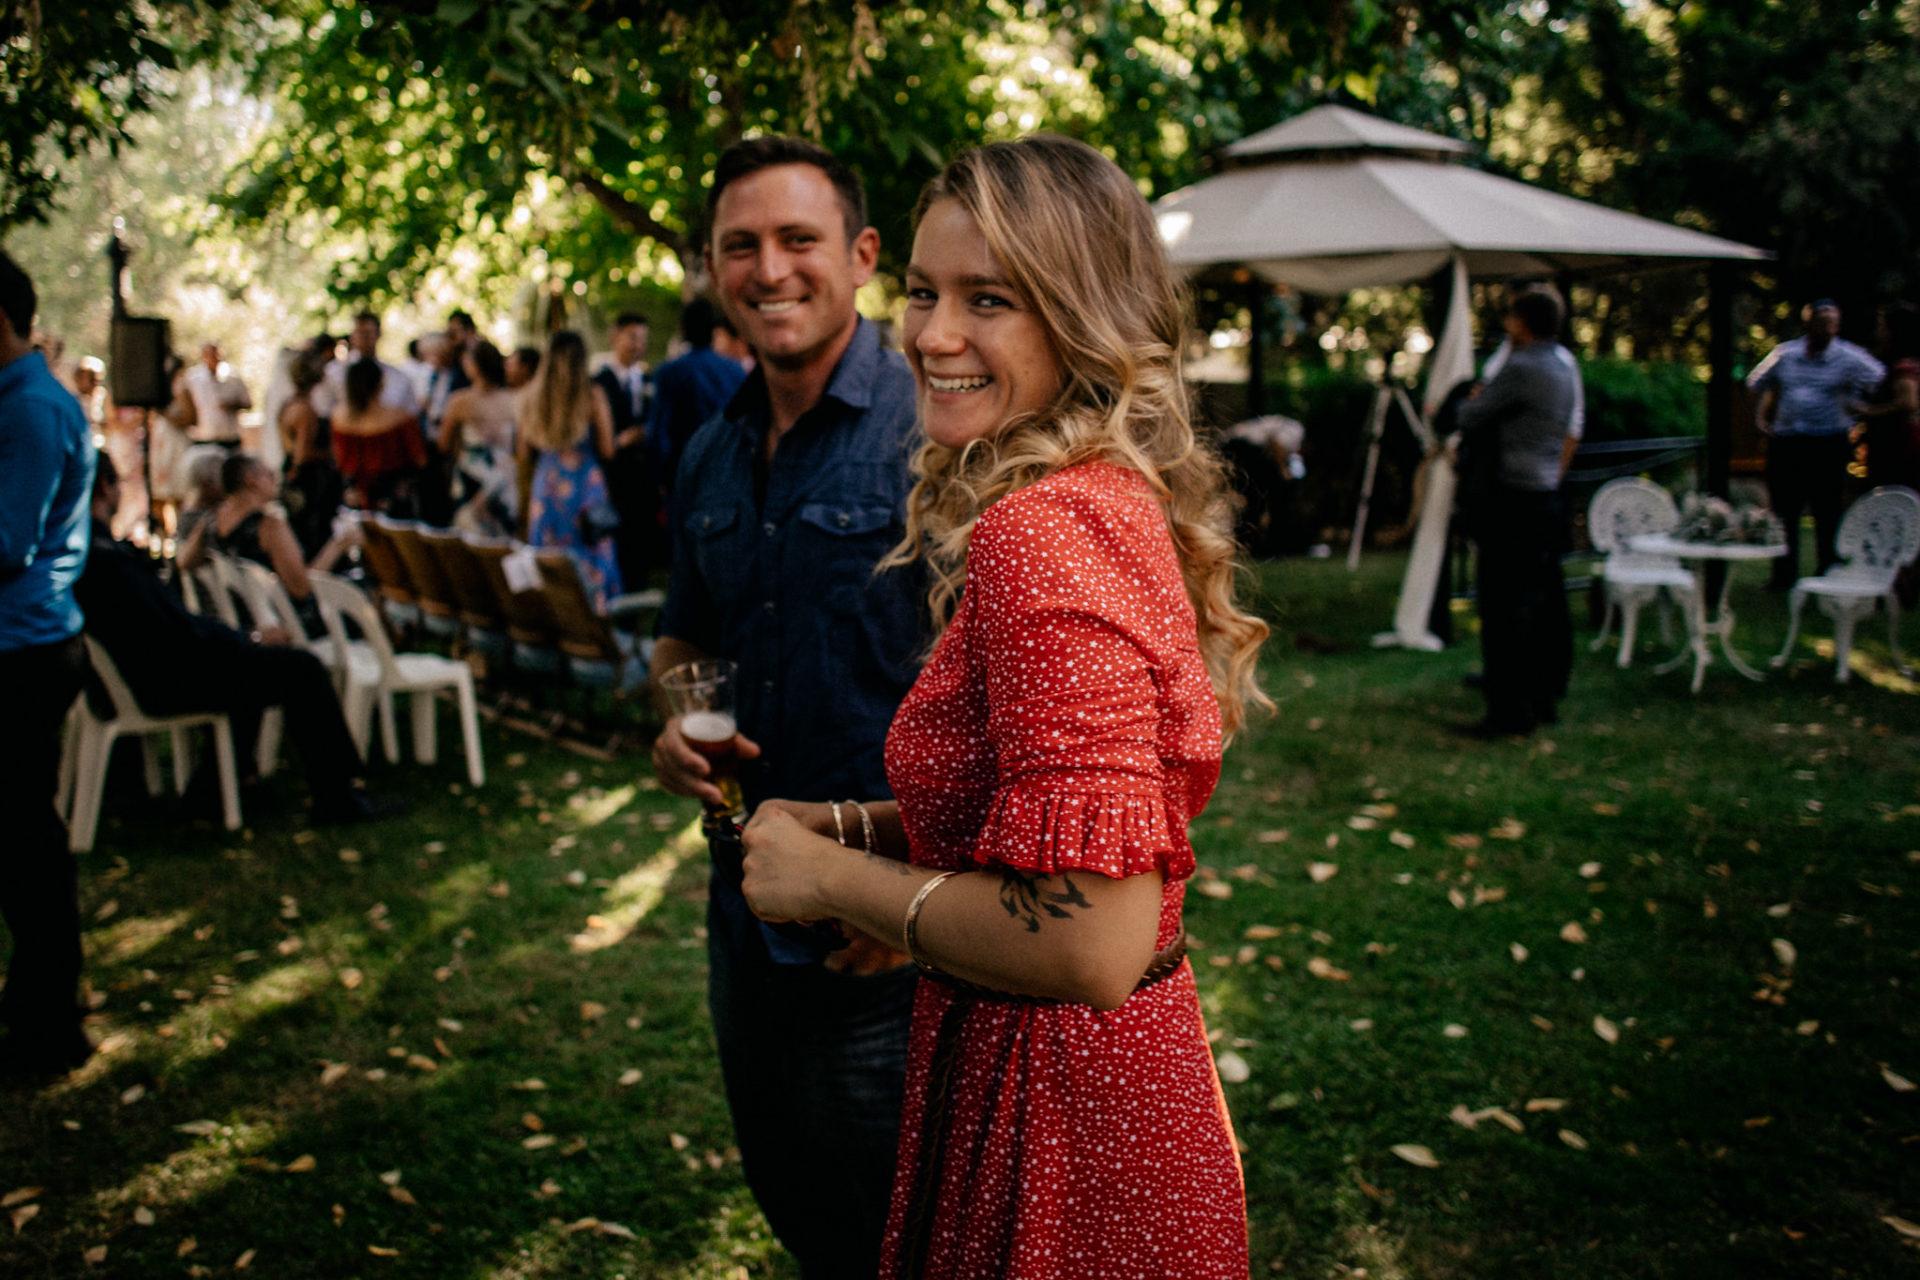 backyard-wedding-australia-melbourne-reception-wedding-guests